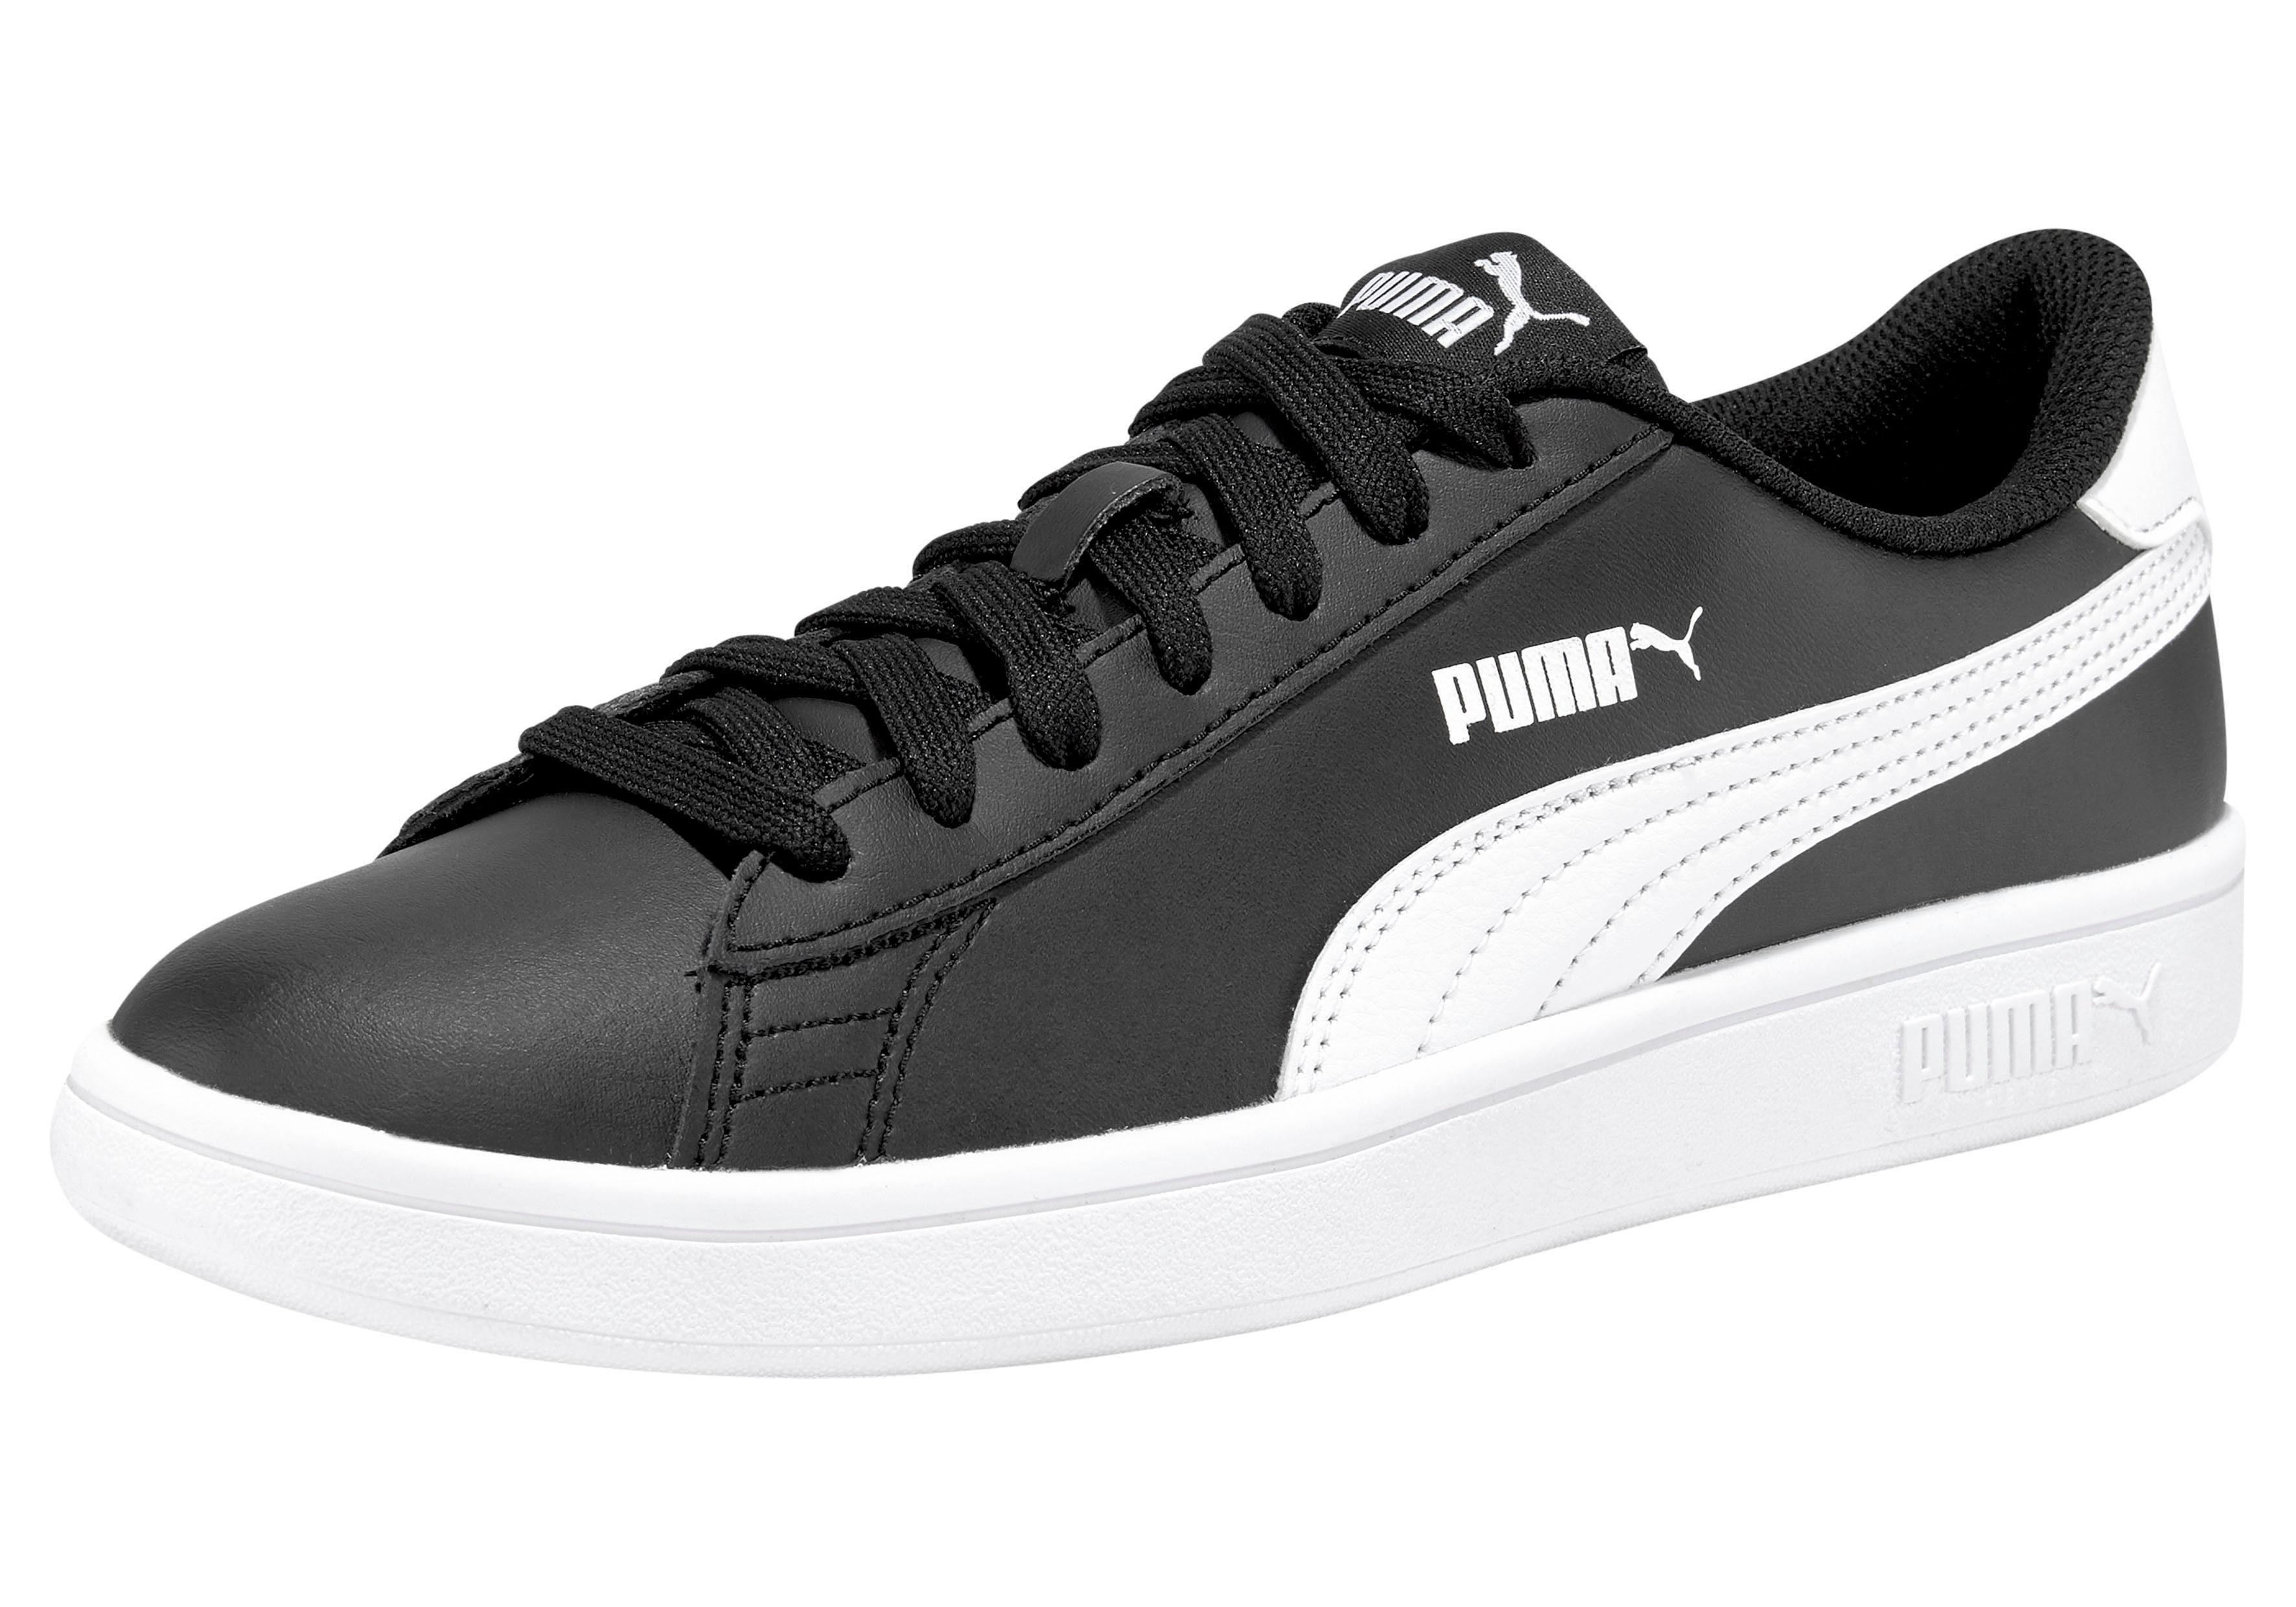 PUMA Sneaker 'Smash v2 Buck' Damen, Rosa Weiß, Größe 36